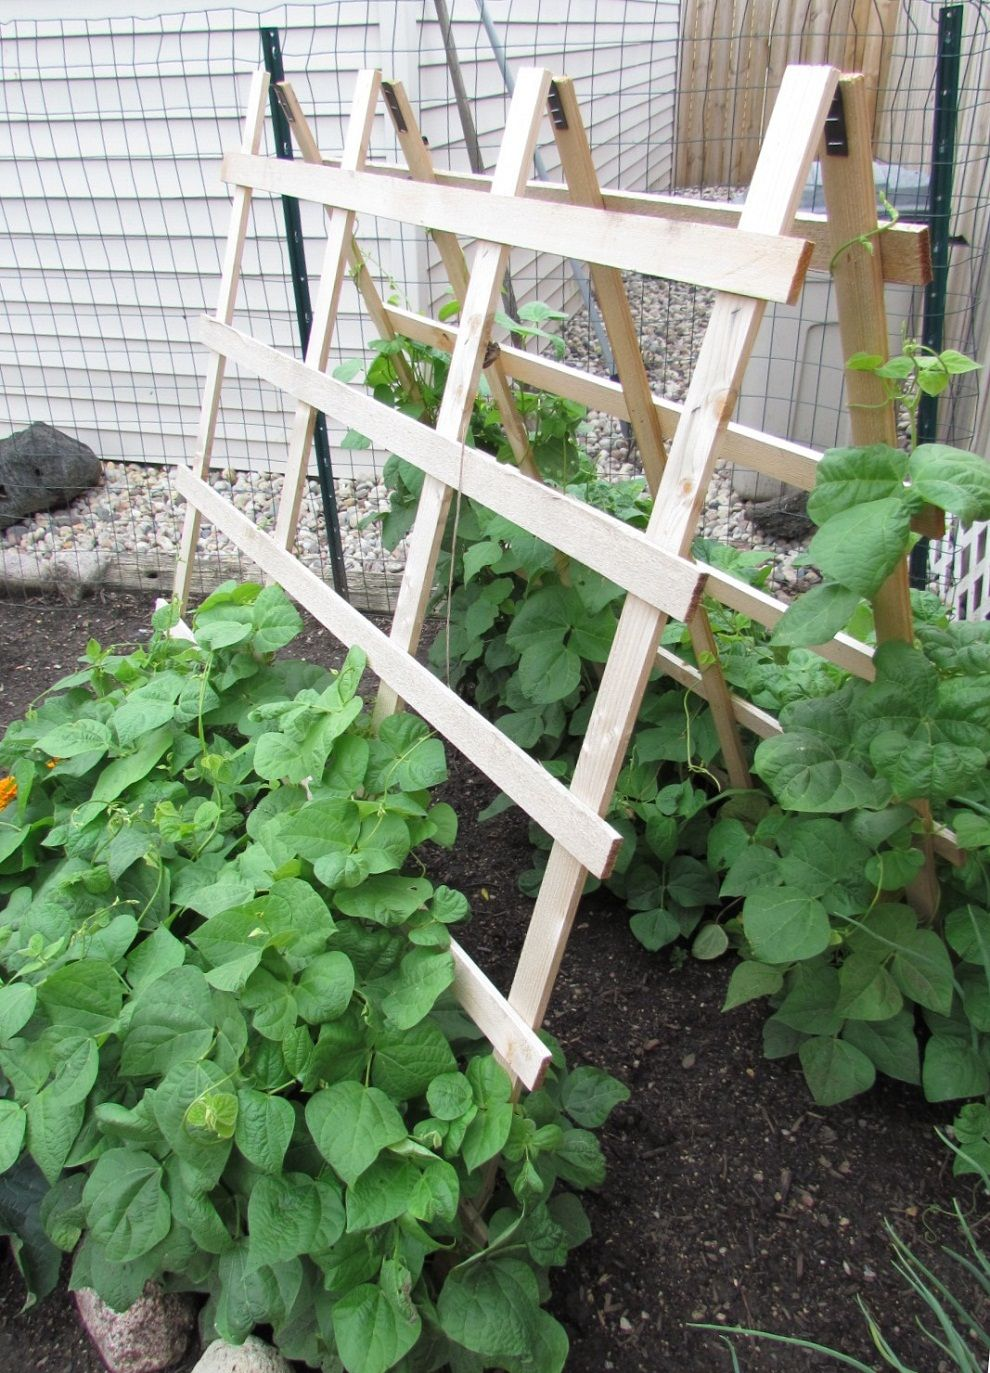 Charming Zucchini Trellis Ideas Part - 10: Green Bean Trellis Wooden Tripod